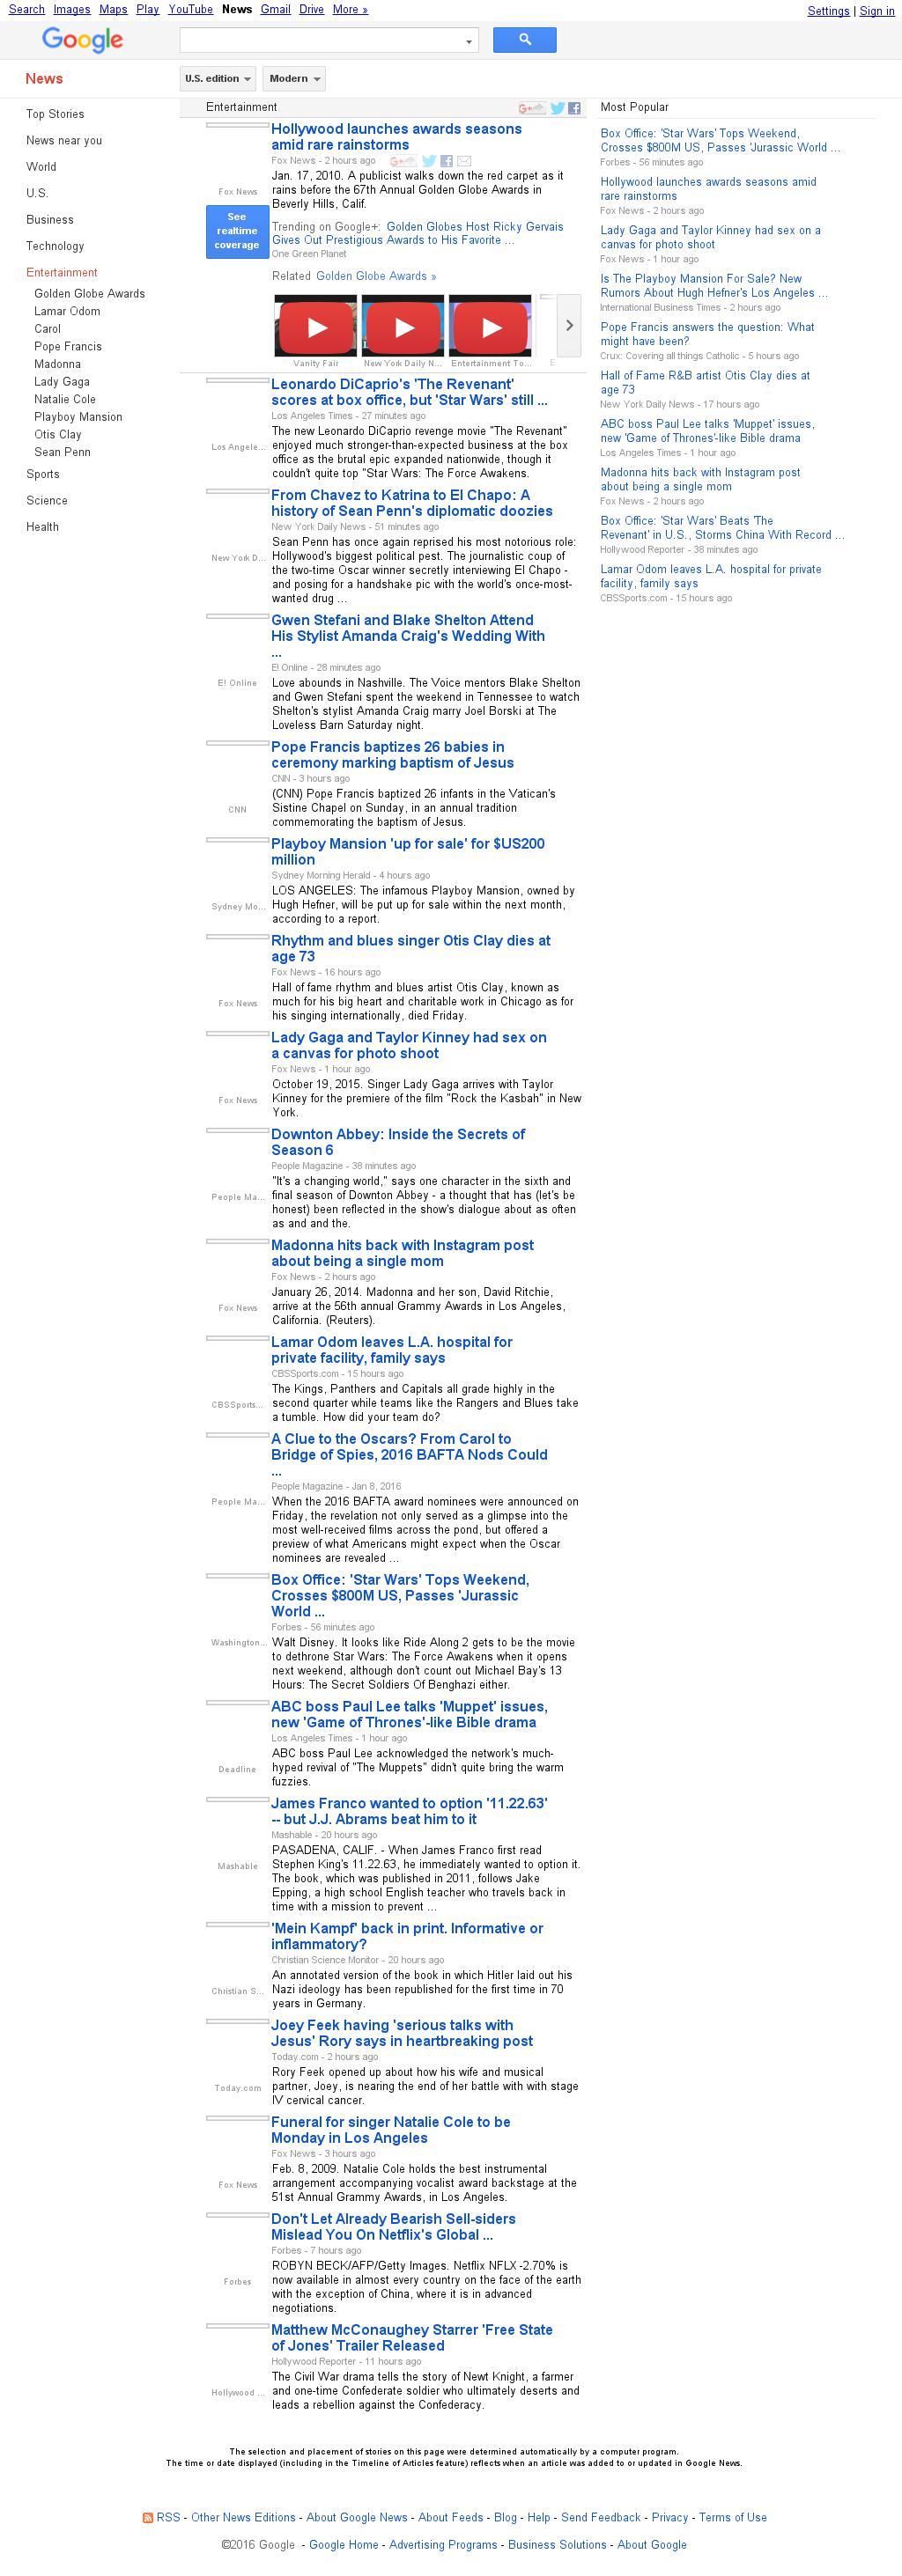 Google News: Entertainment at Sunday Jan. 10, 2016, 5:09 p.m. UTC